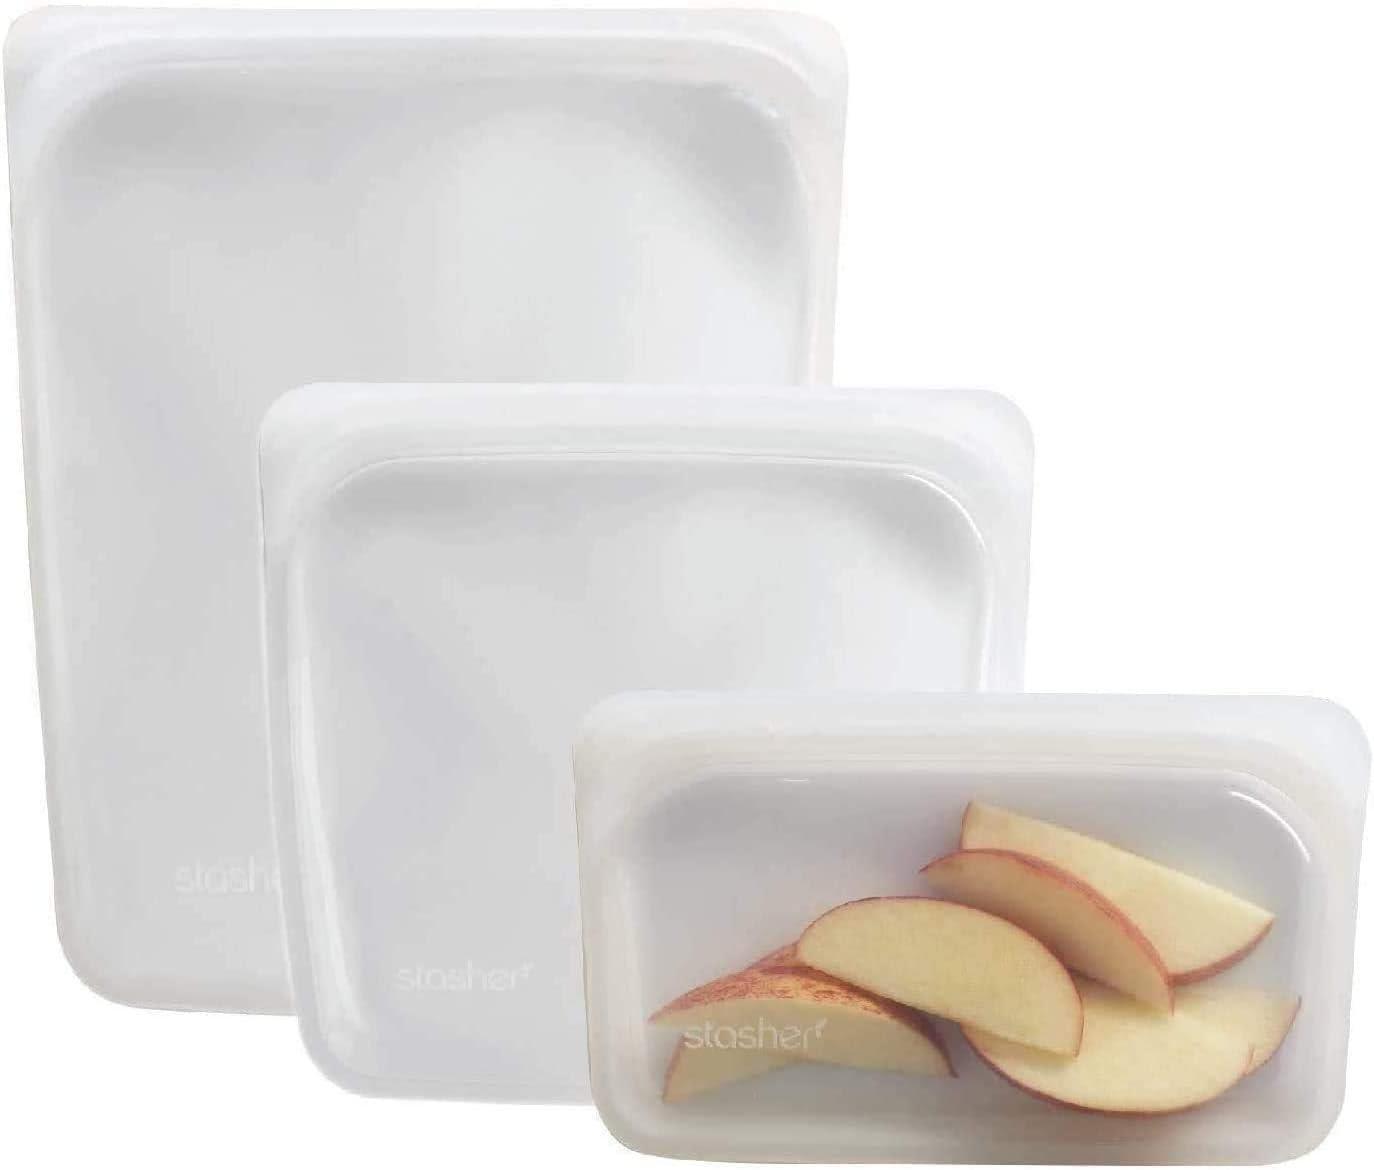 Stasher Reusable Silicone Food Bag, Sandwich Bag, Snack Bag and 1/2 Gallon Bag, Sous Vide Bag, Storage Bag (Clear, 3 Pack)